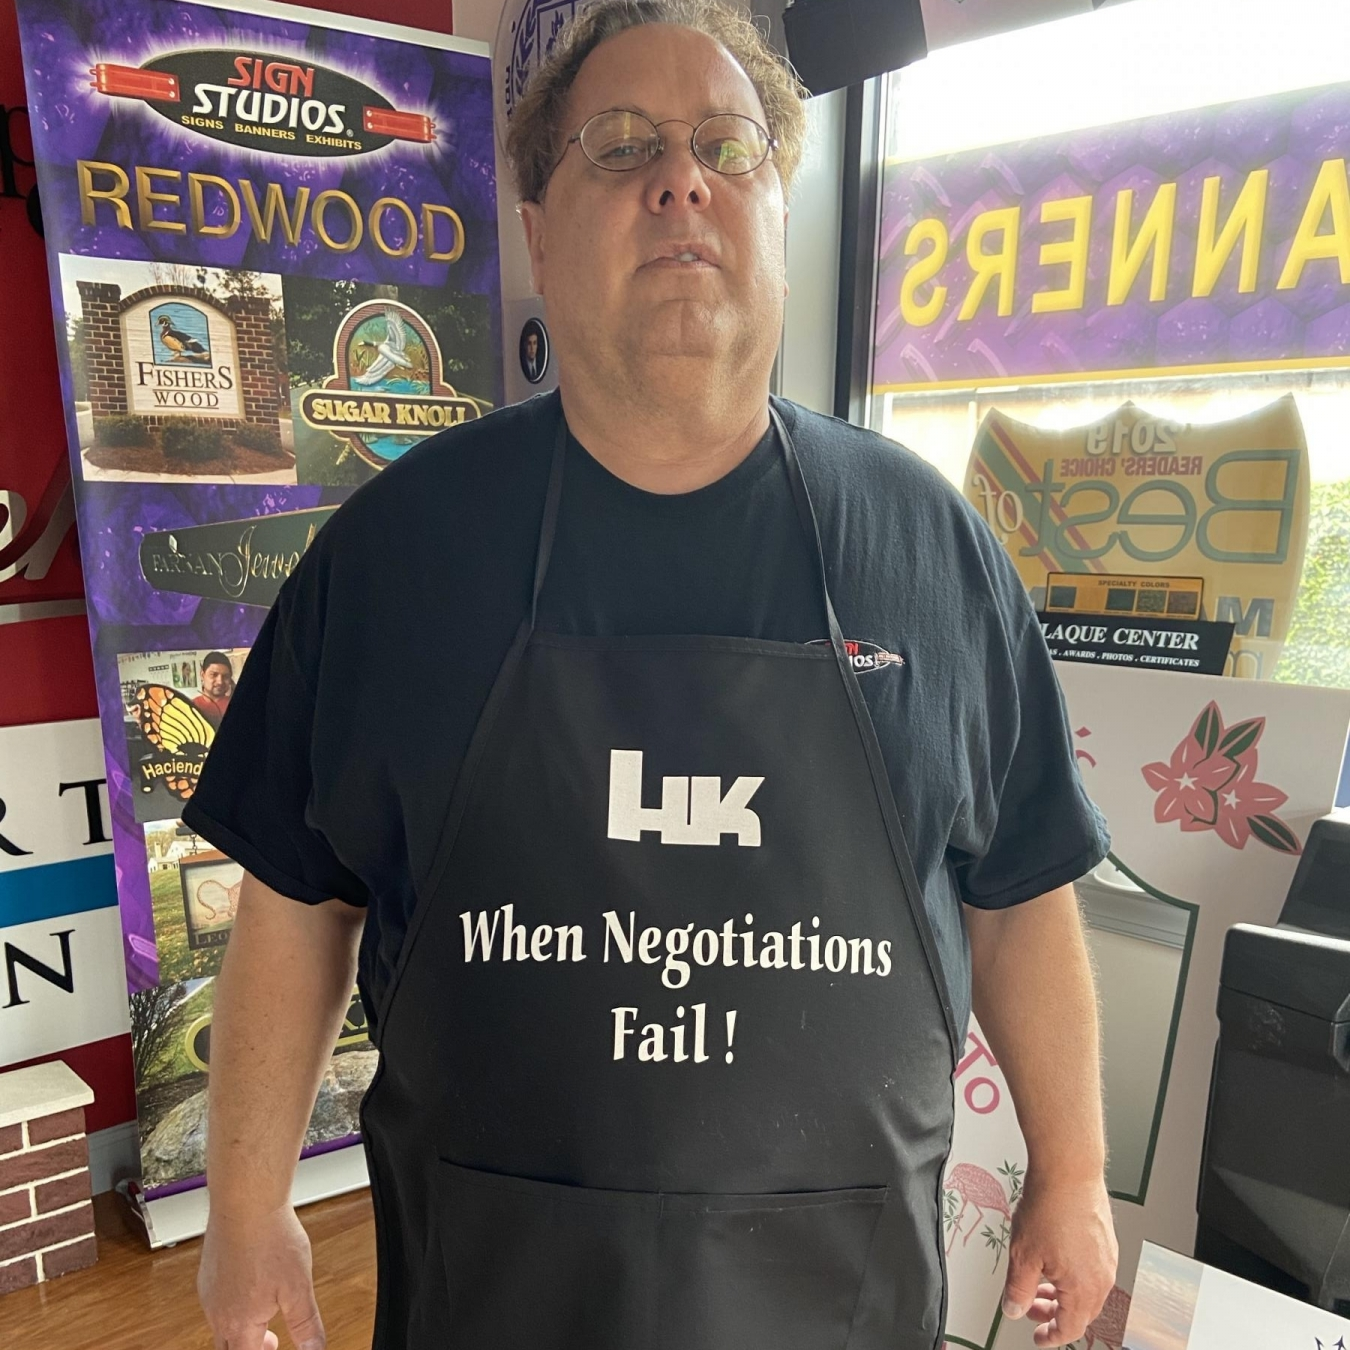 HK When Negotiations Fail Apron Worn